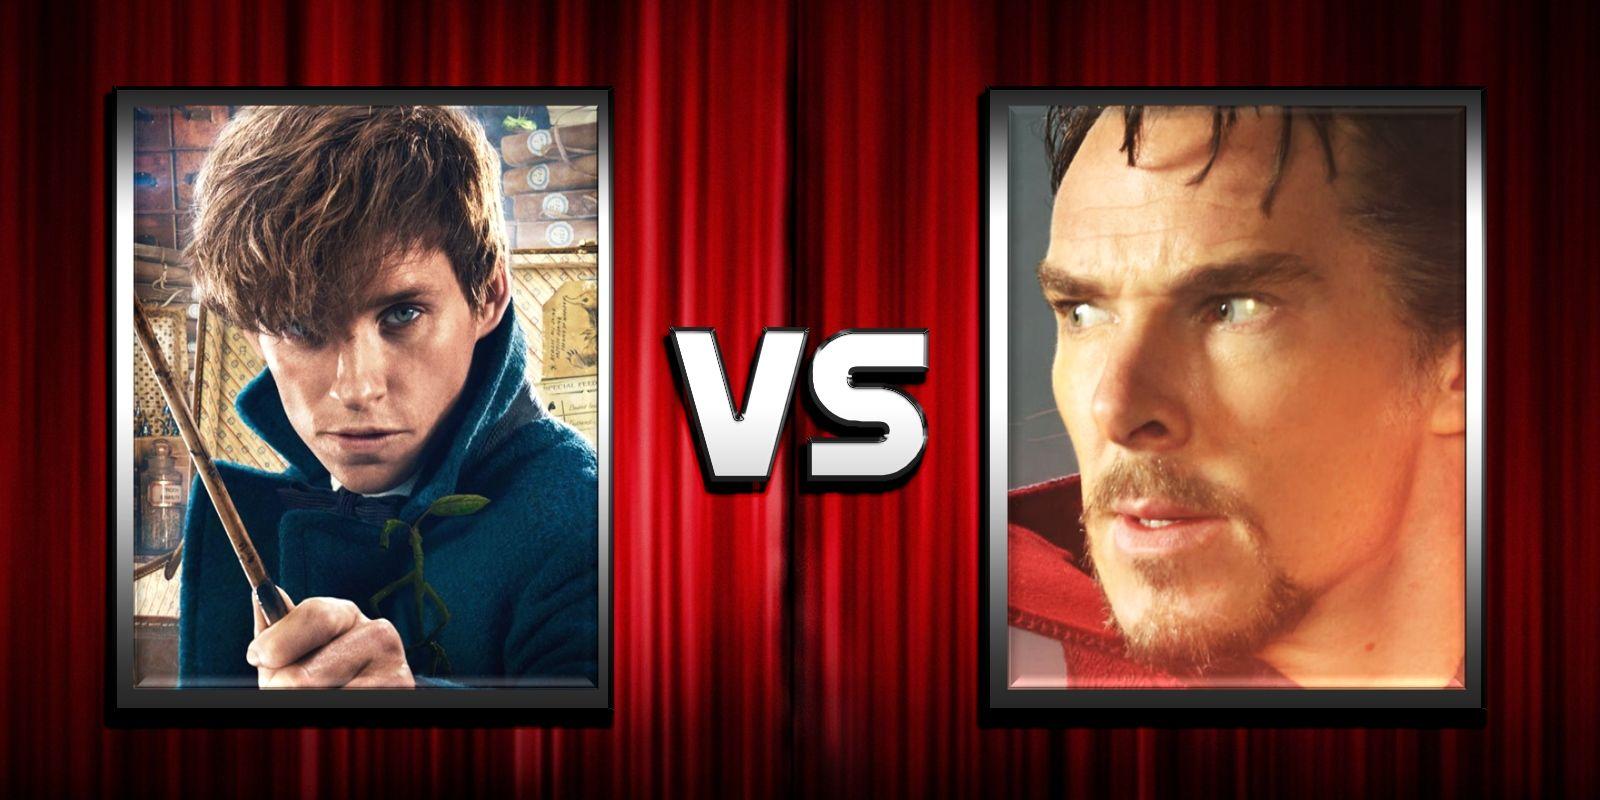 Box office prediction fantastic beasts vs doctor strange - 2016 box office predictions ...